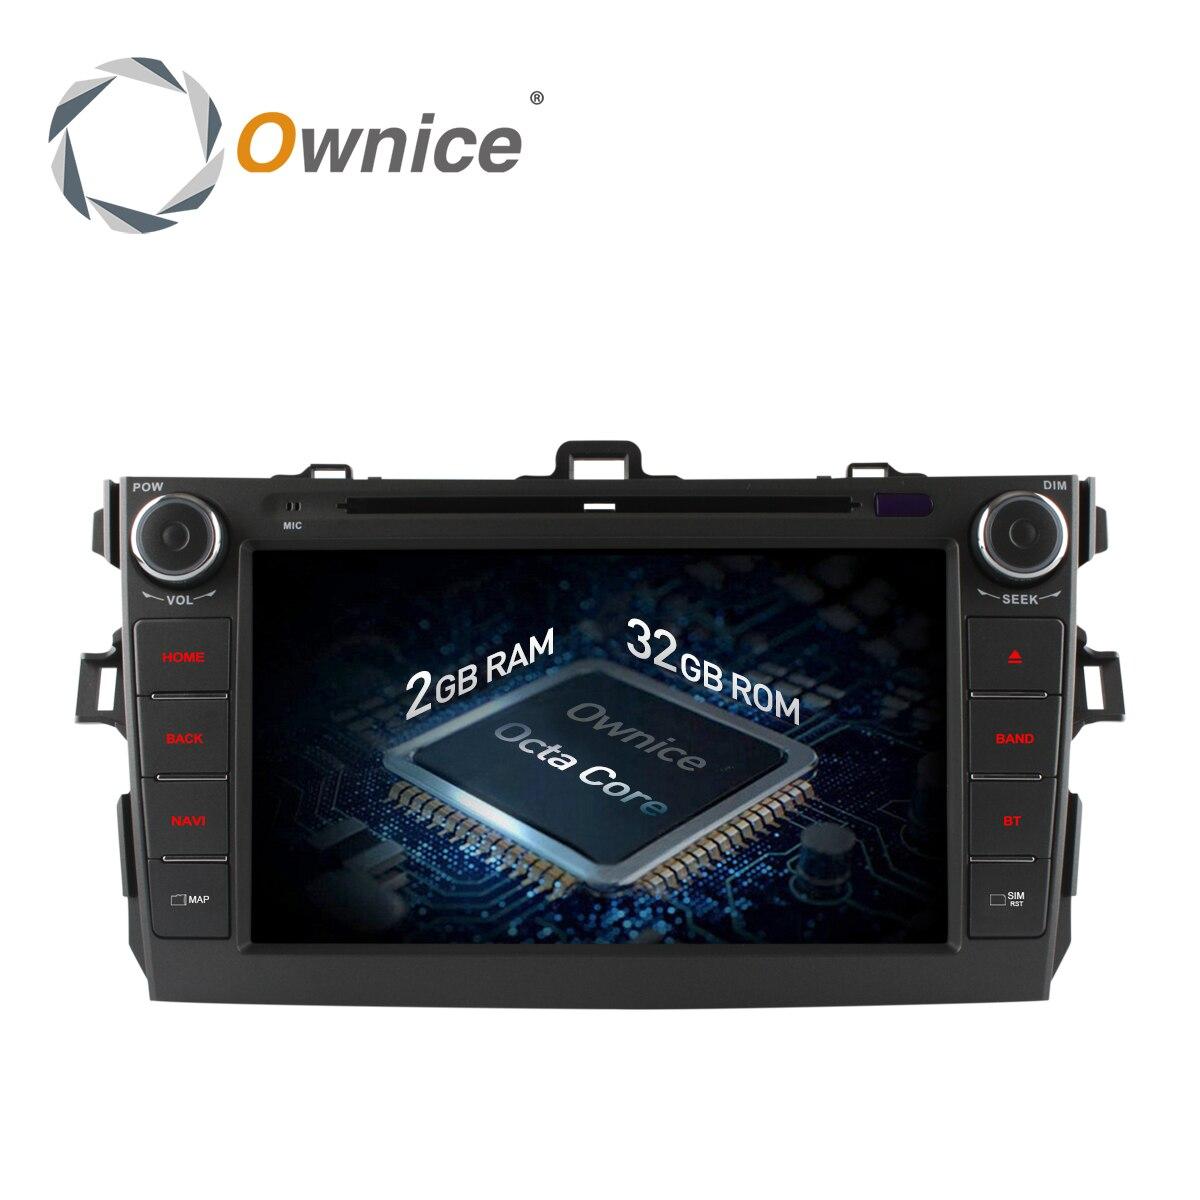 Ownice C500 Android 6.0 Octa 8 Core for Toyota Corolla 2007 - 2011 Car DVD Radio GPS Navi wifi 4G LTE Network 2GB RAM 32GB ROM